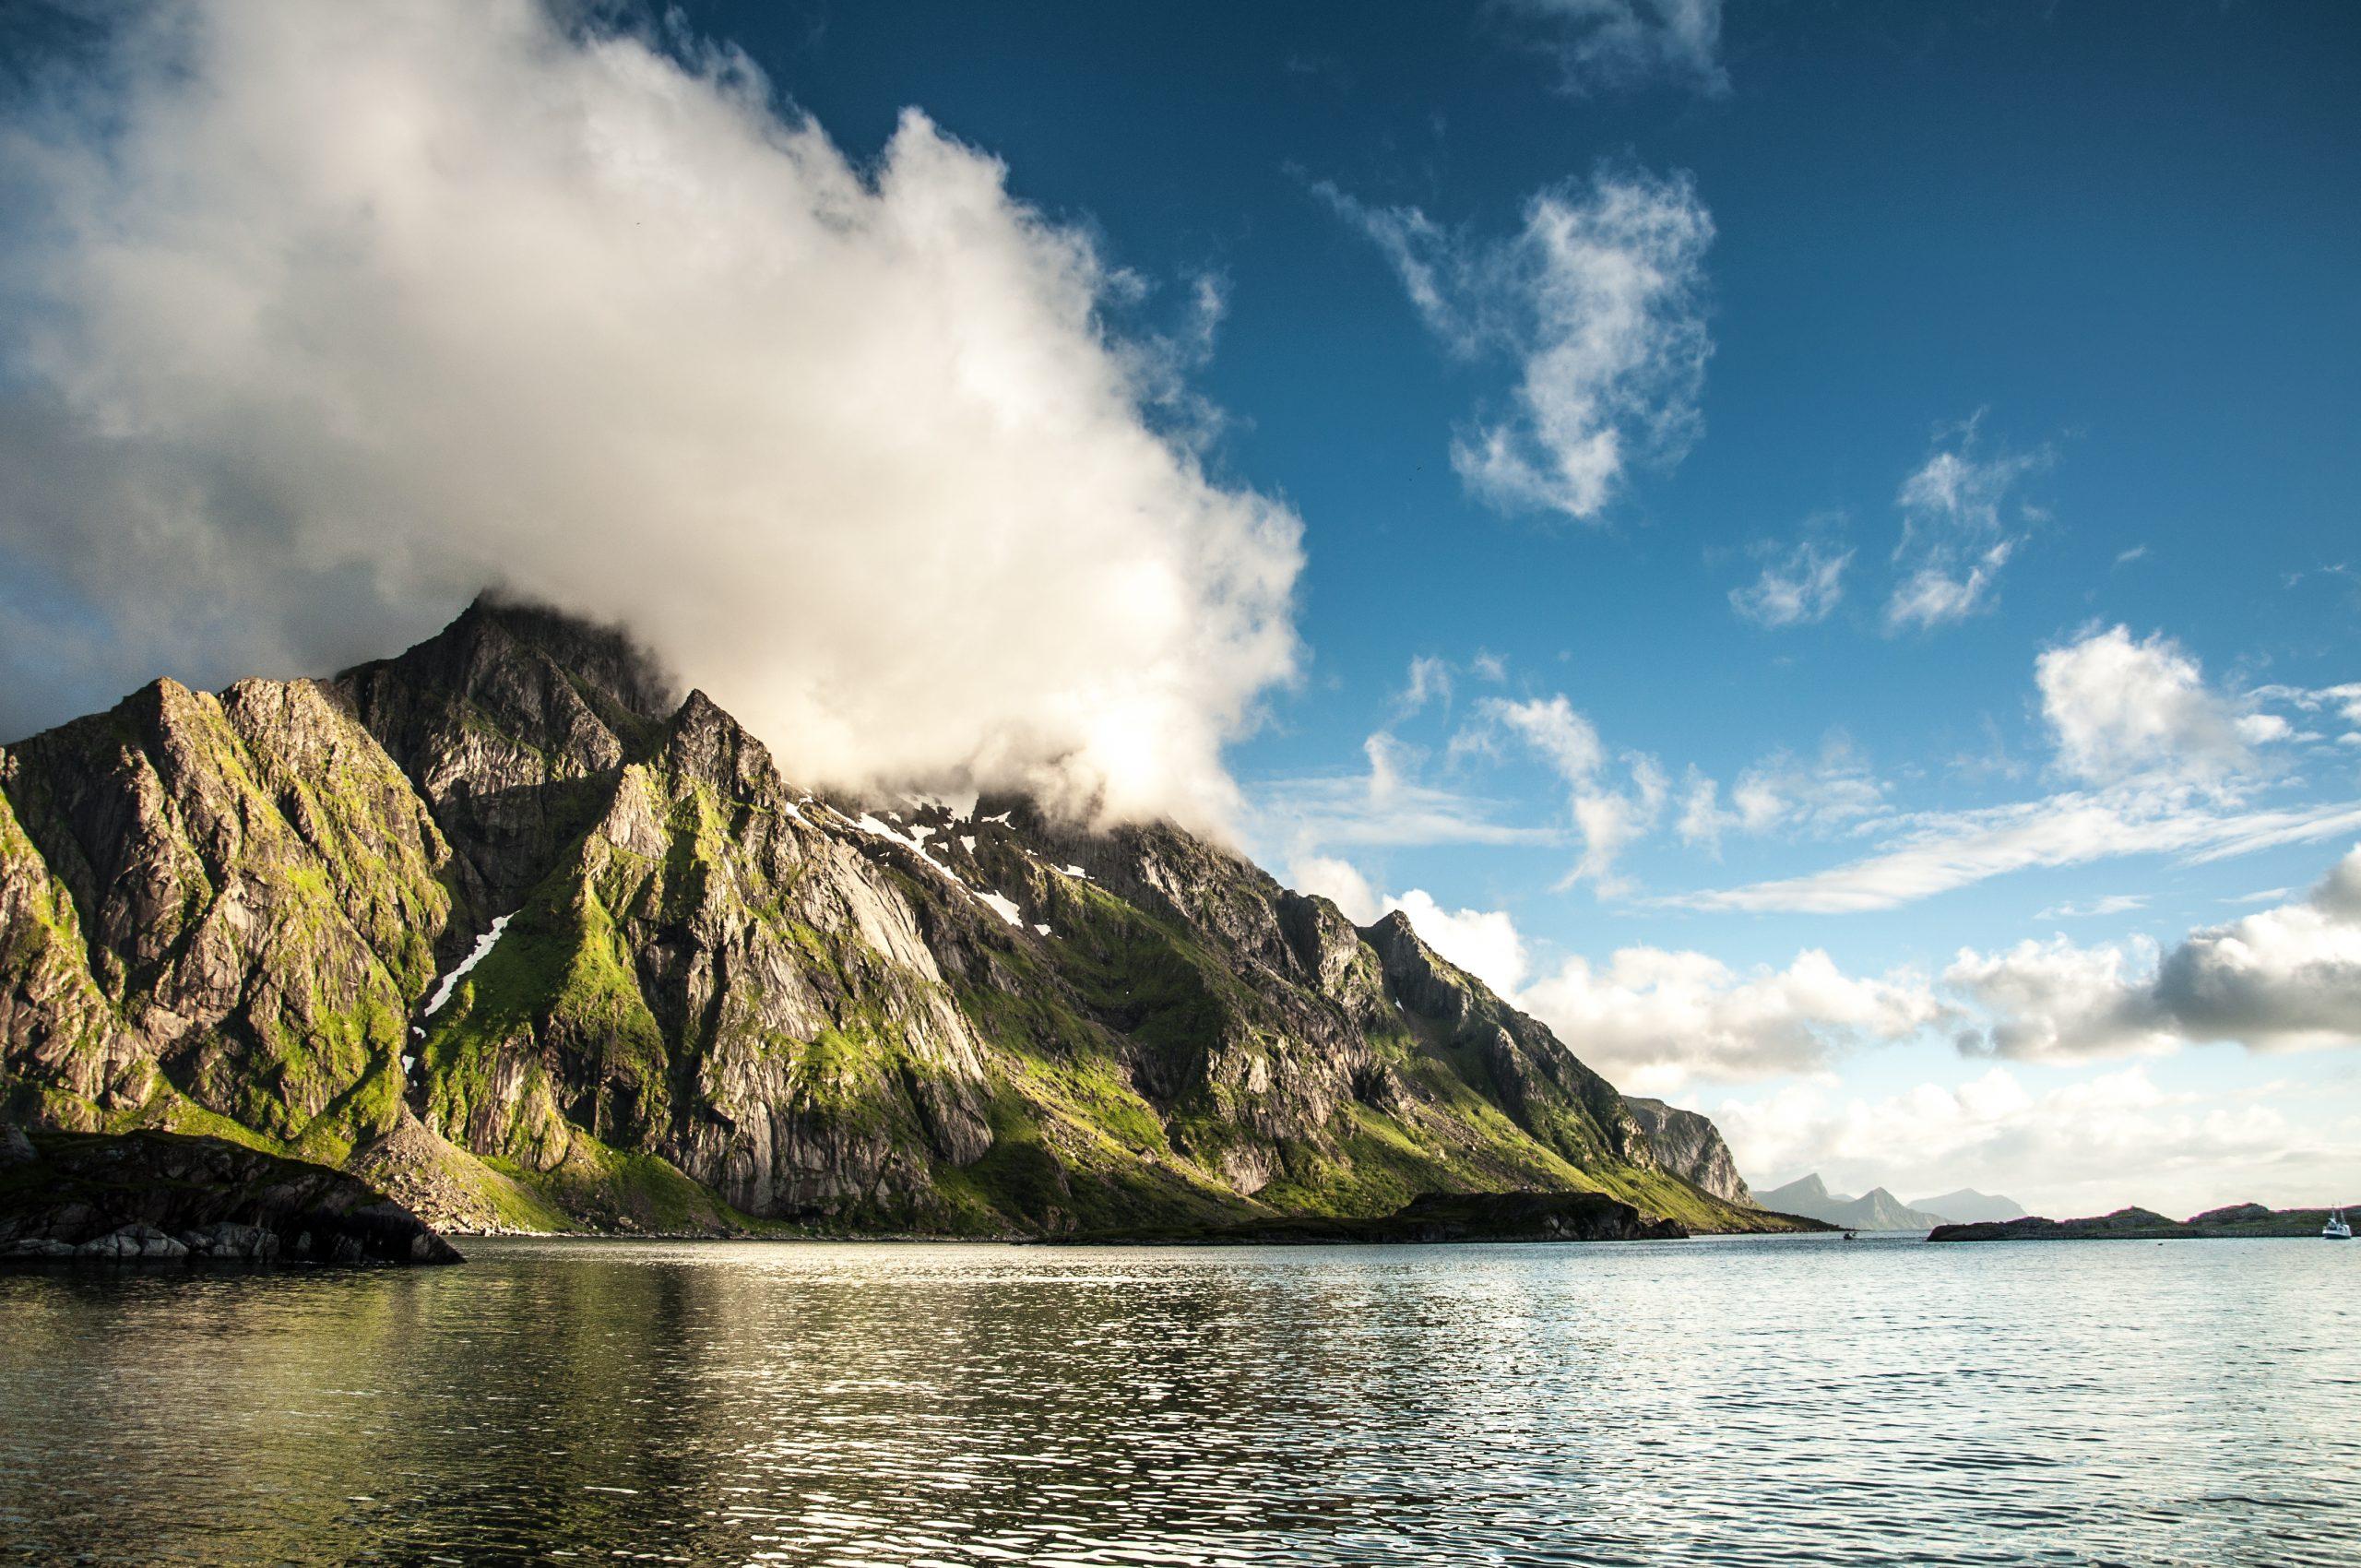 Isole-lofoten-maervol